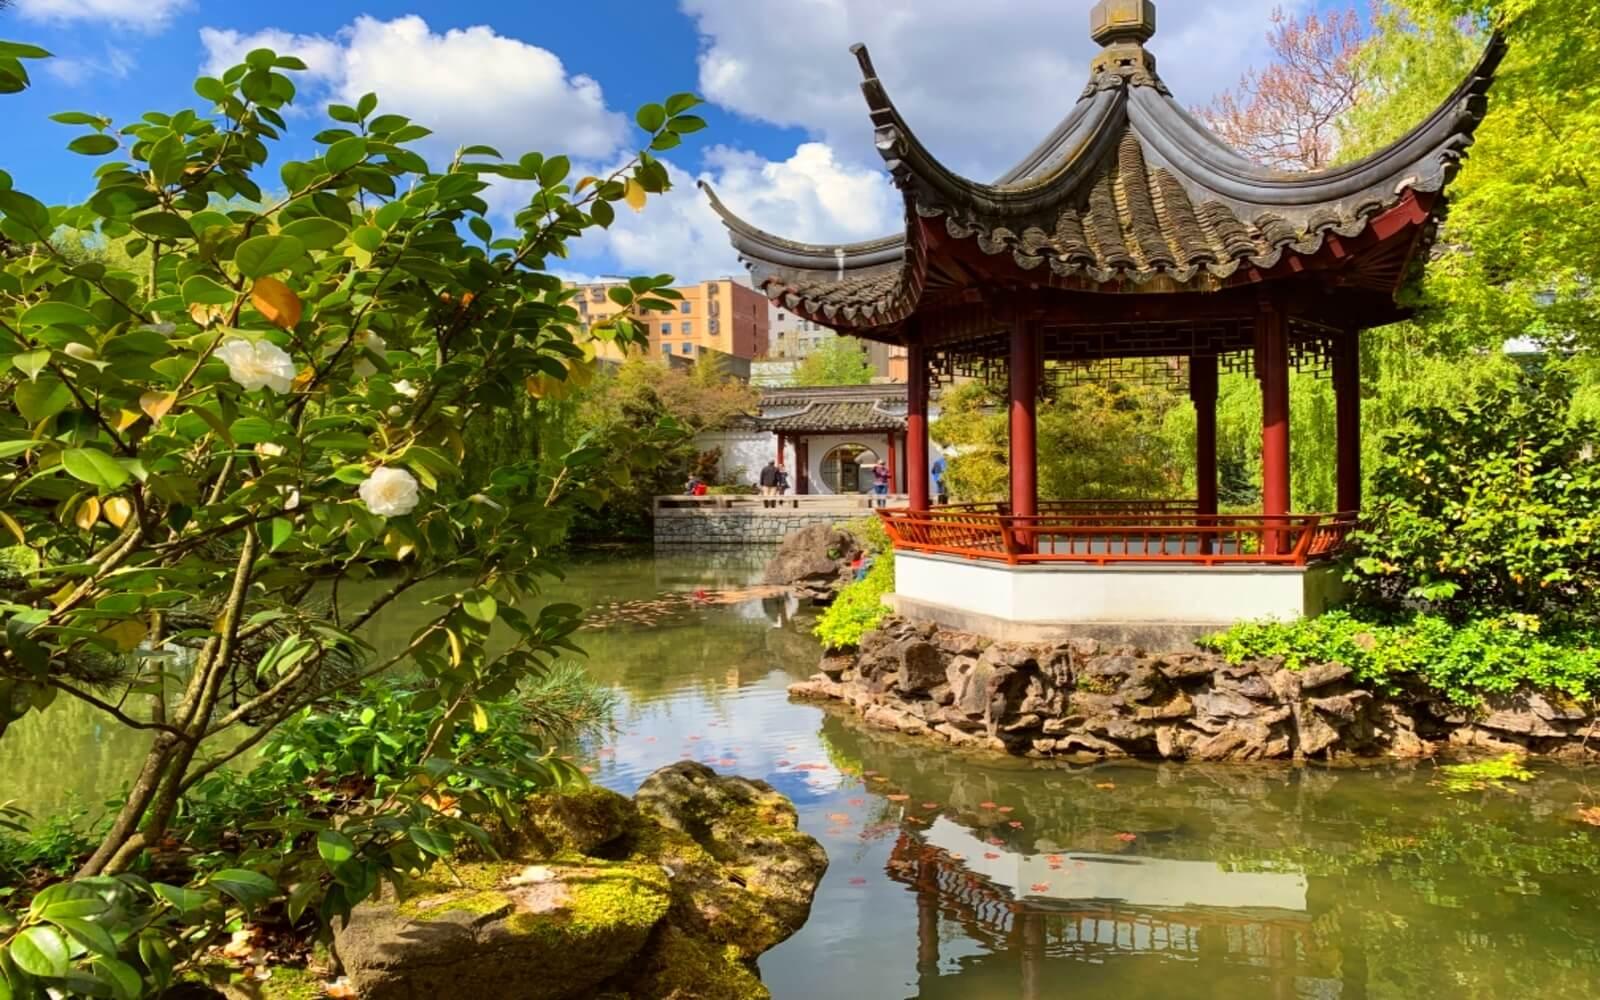 The Dr. Sun Yat-Sen Classical Chinese Garden